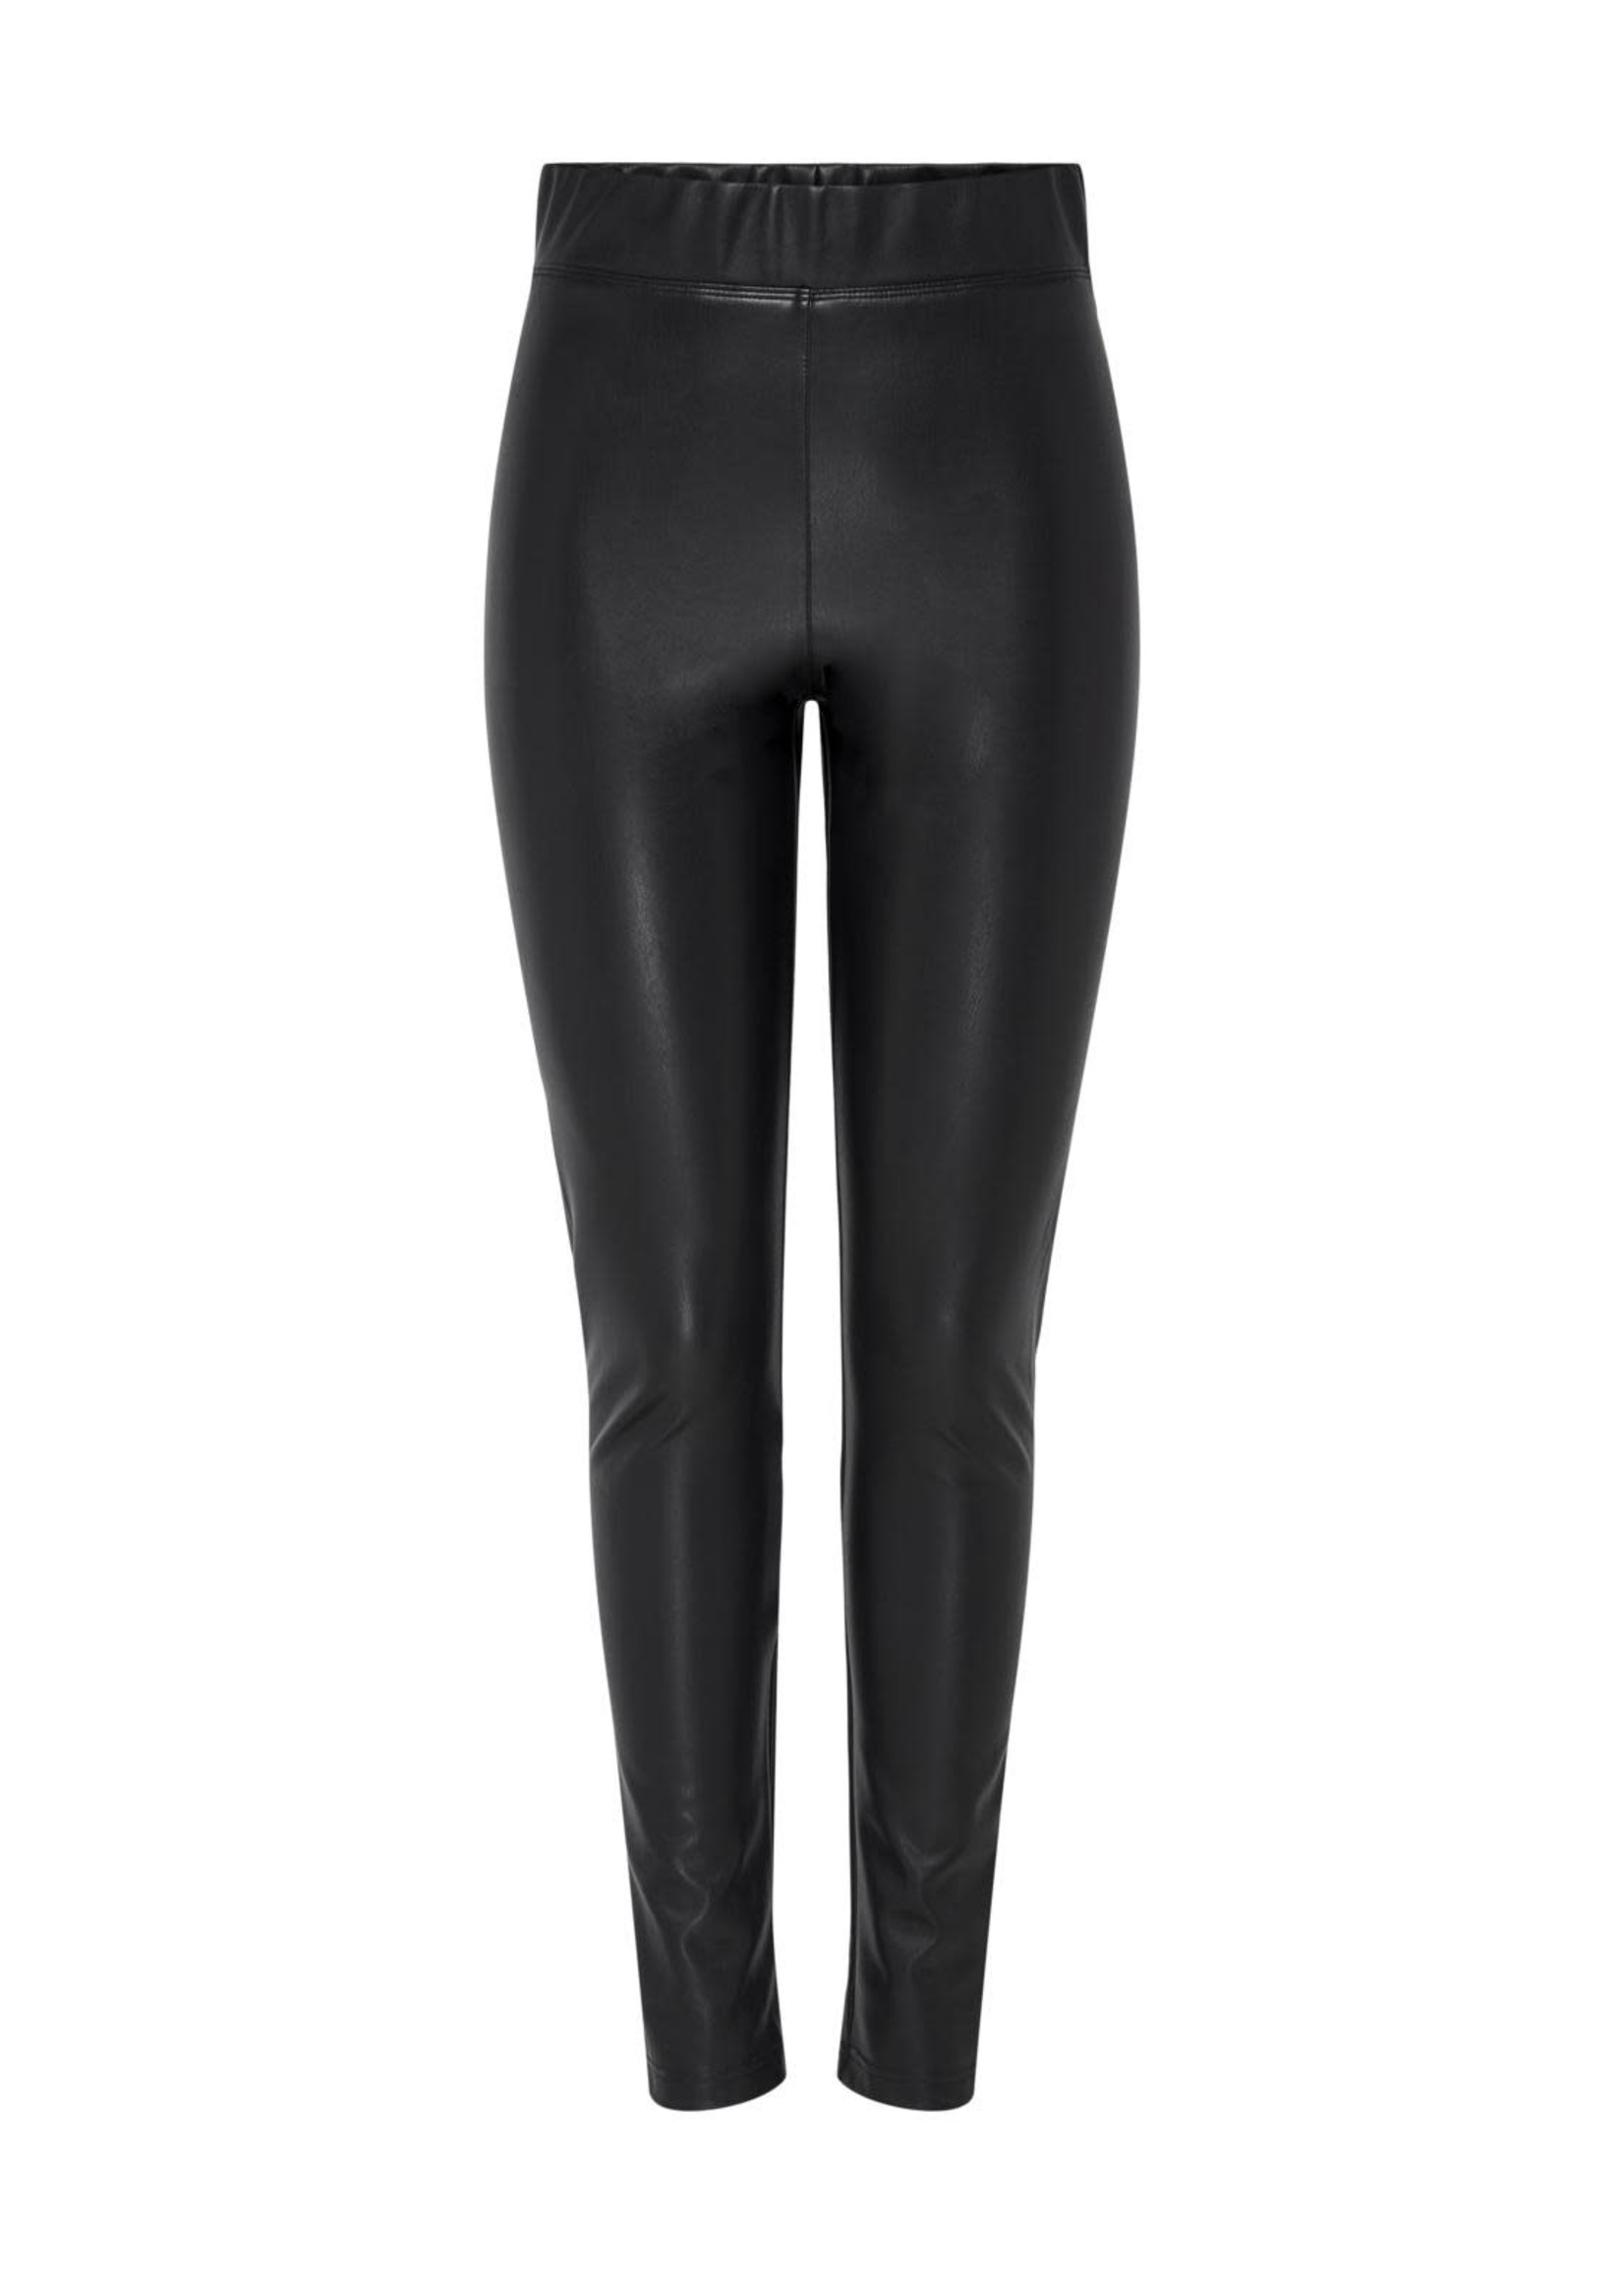 ONLY cool coated legging, black